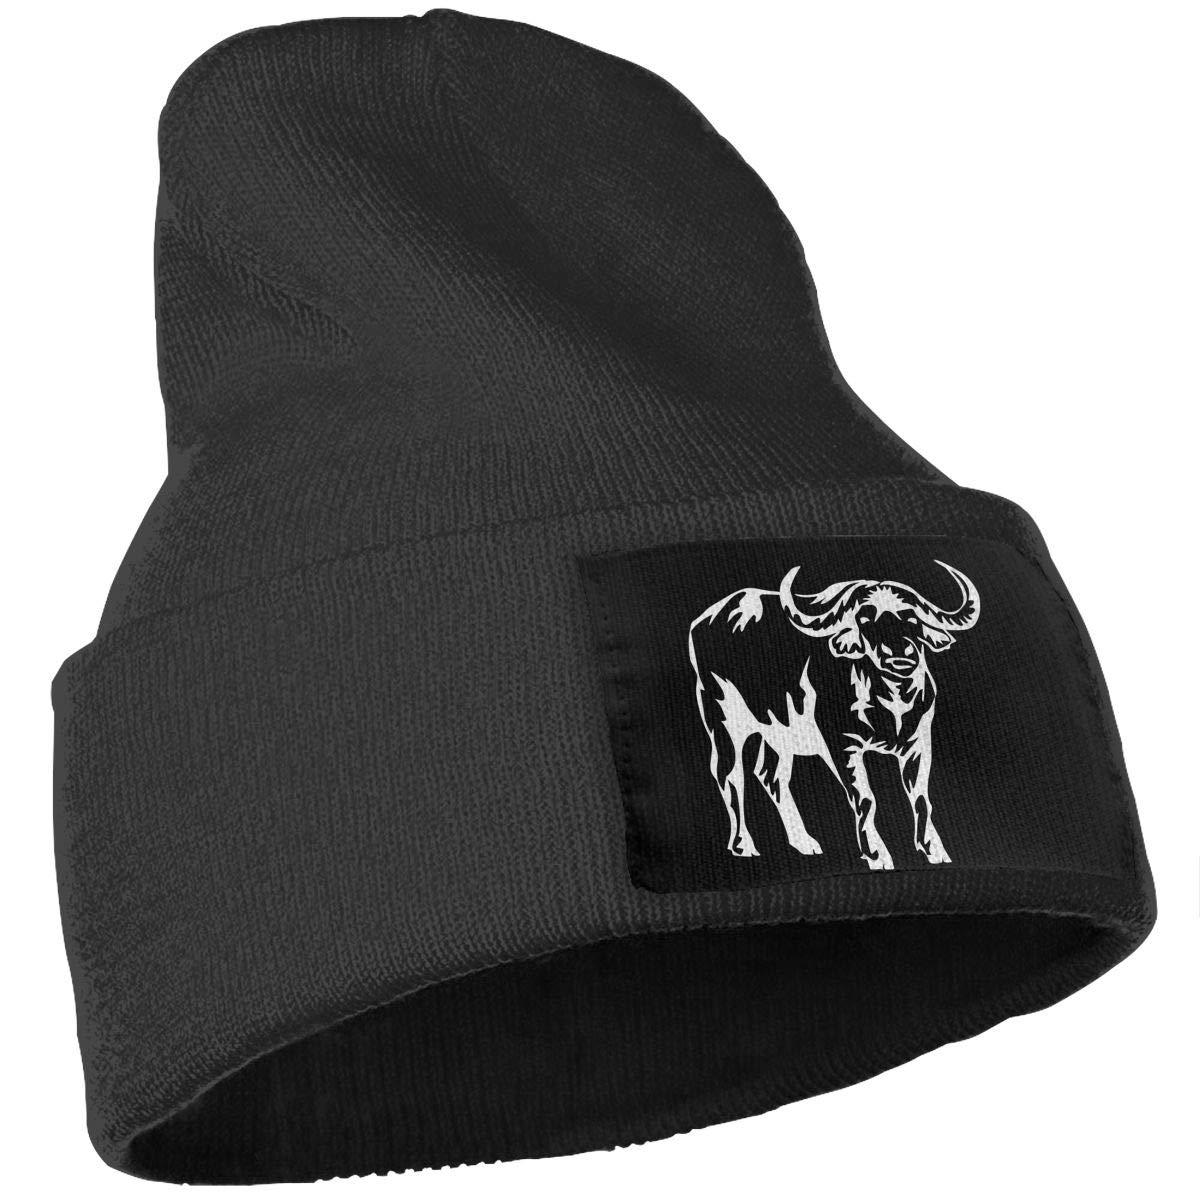 Water Buff Skull Cap Men Women Knit Hats Stretchy /& Soft Beanie